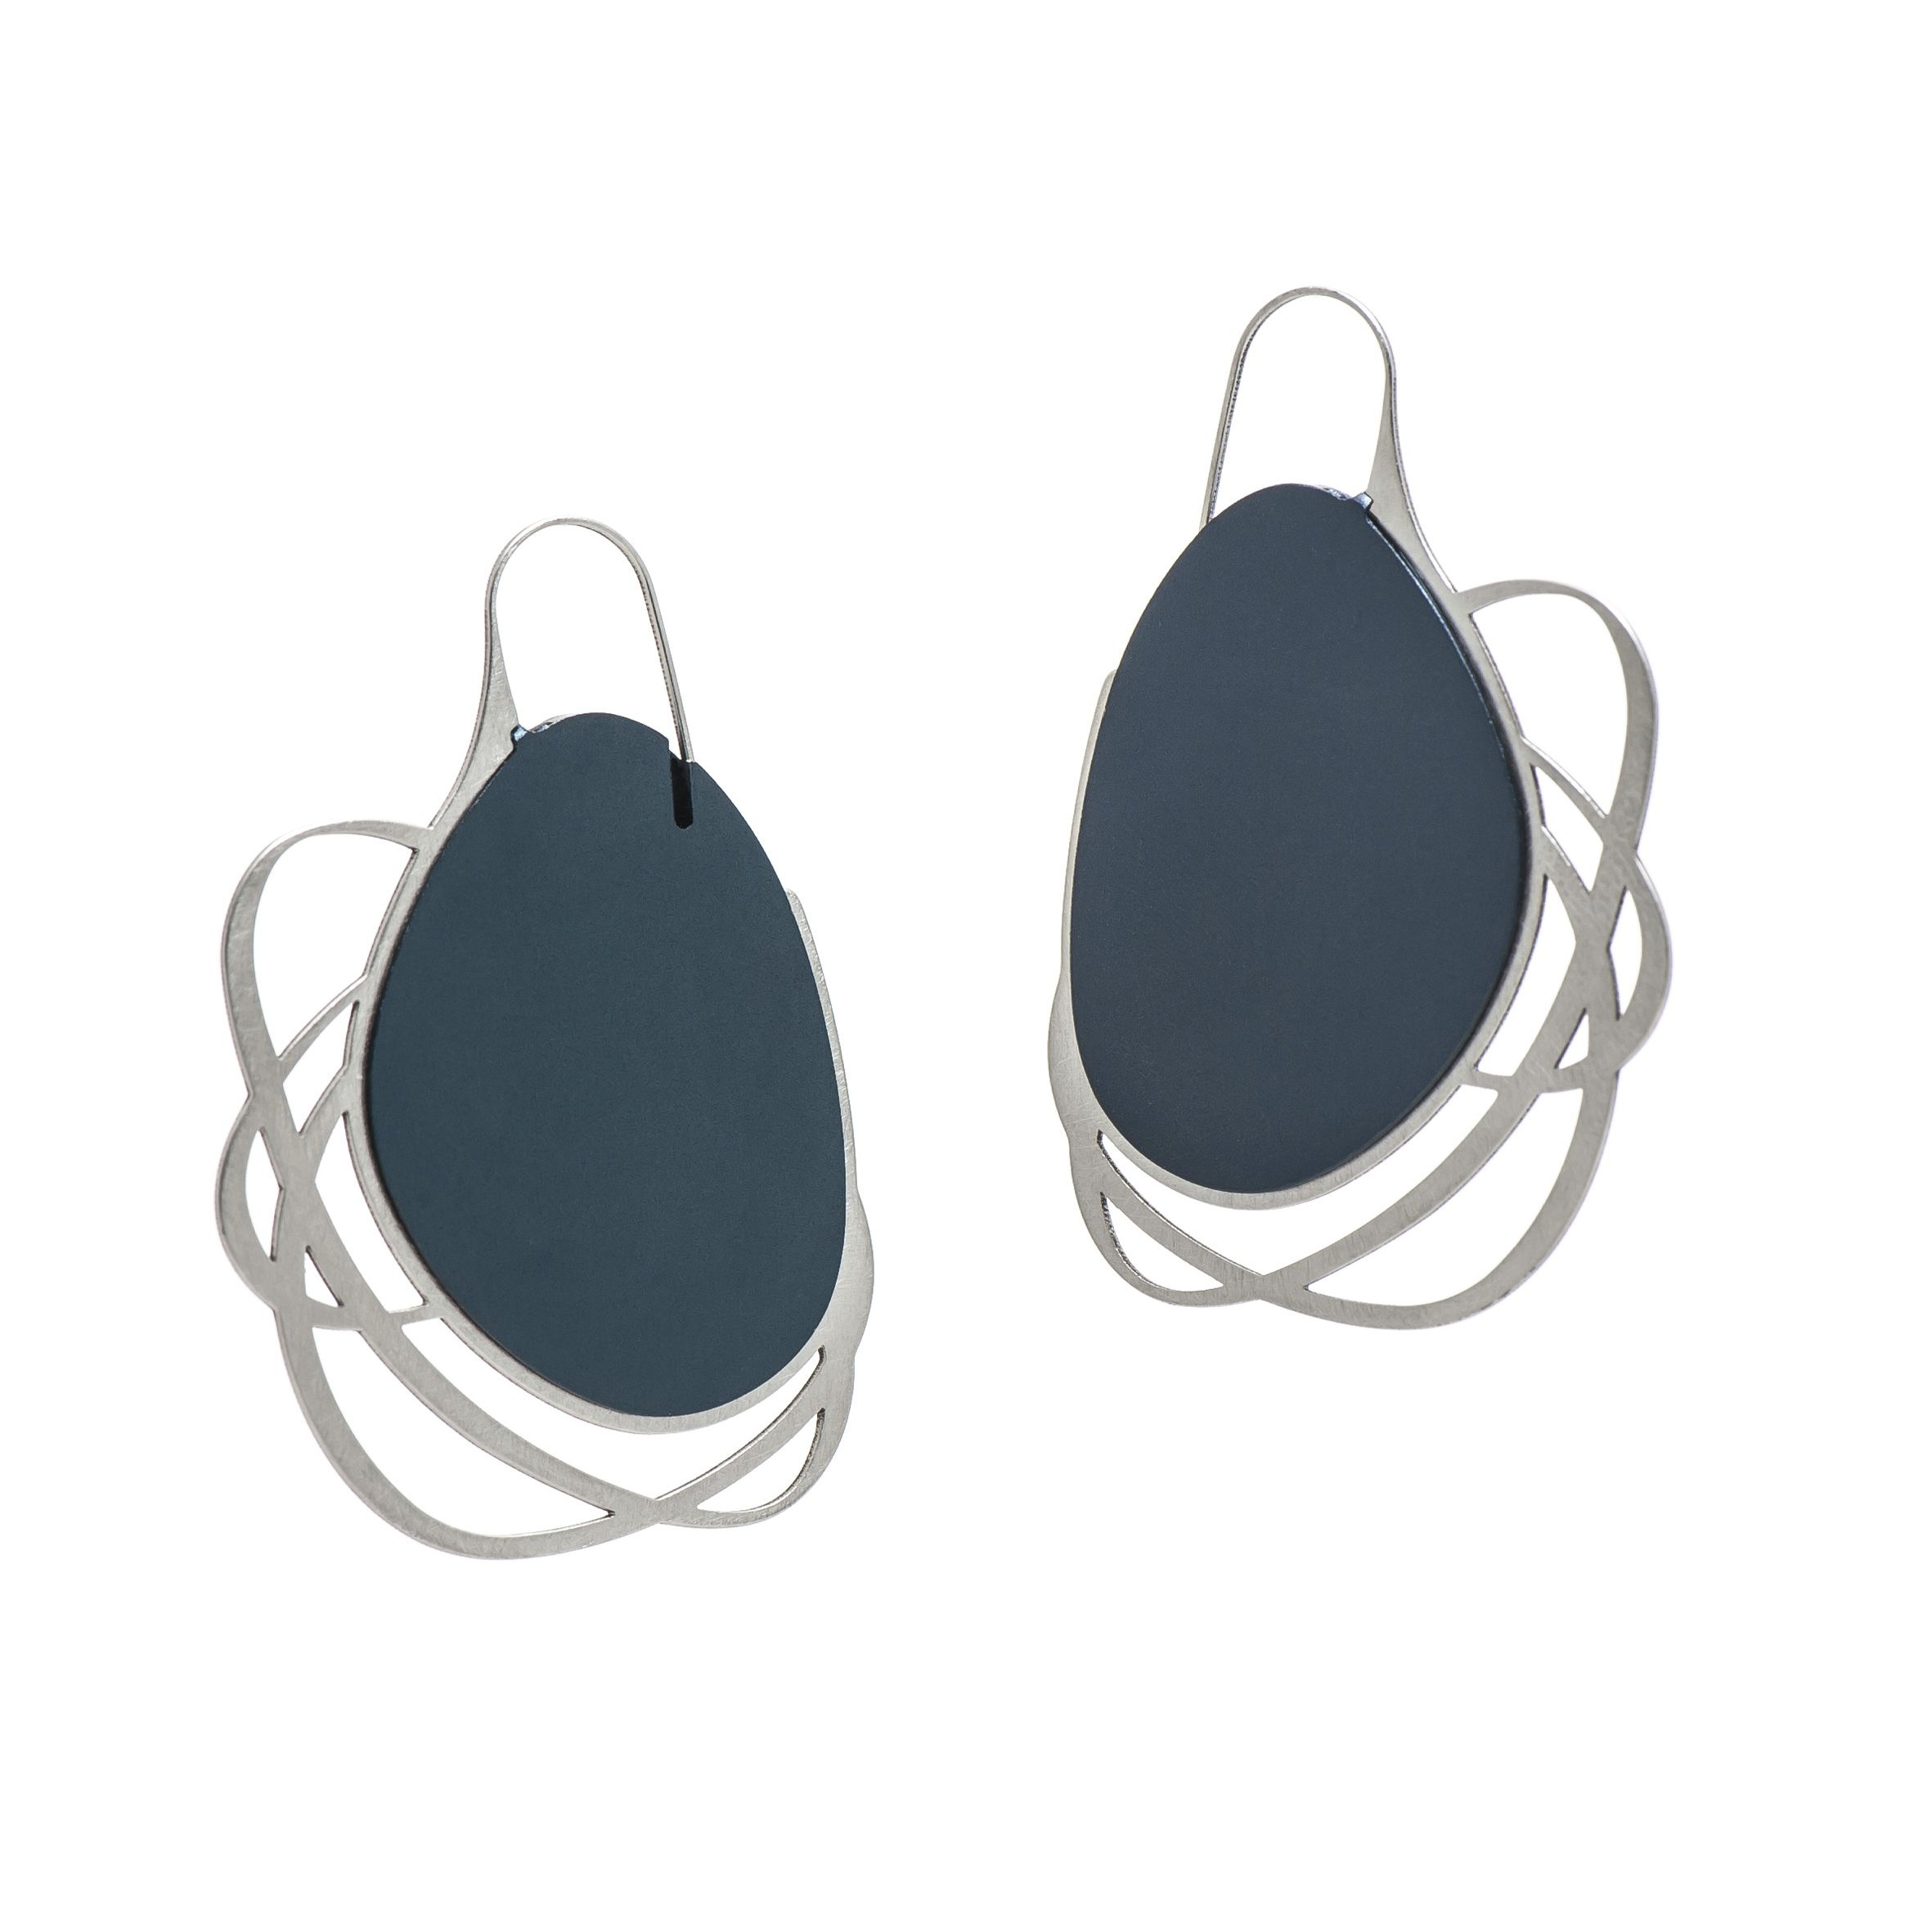 Pebble Earring Series – Boldly Elegant by inSync design from Australia insync